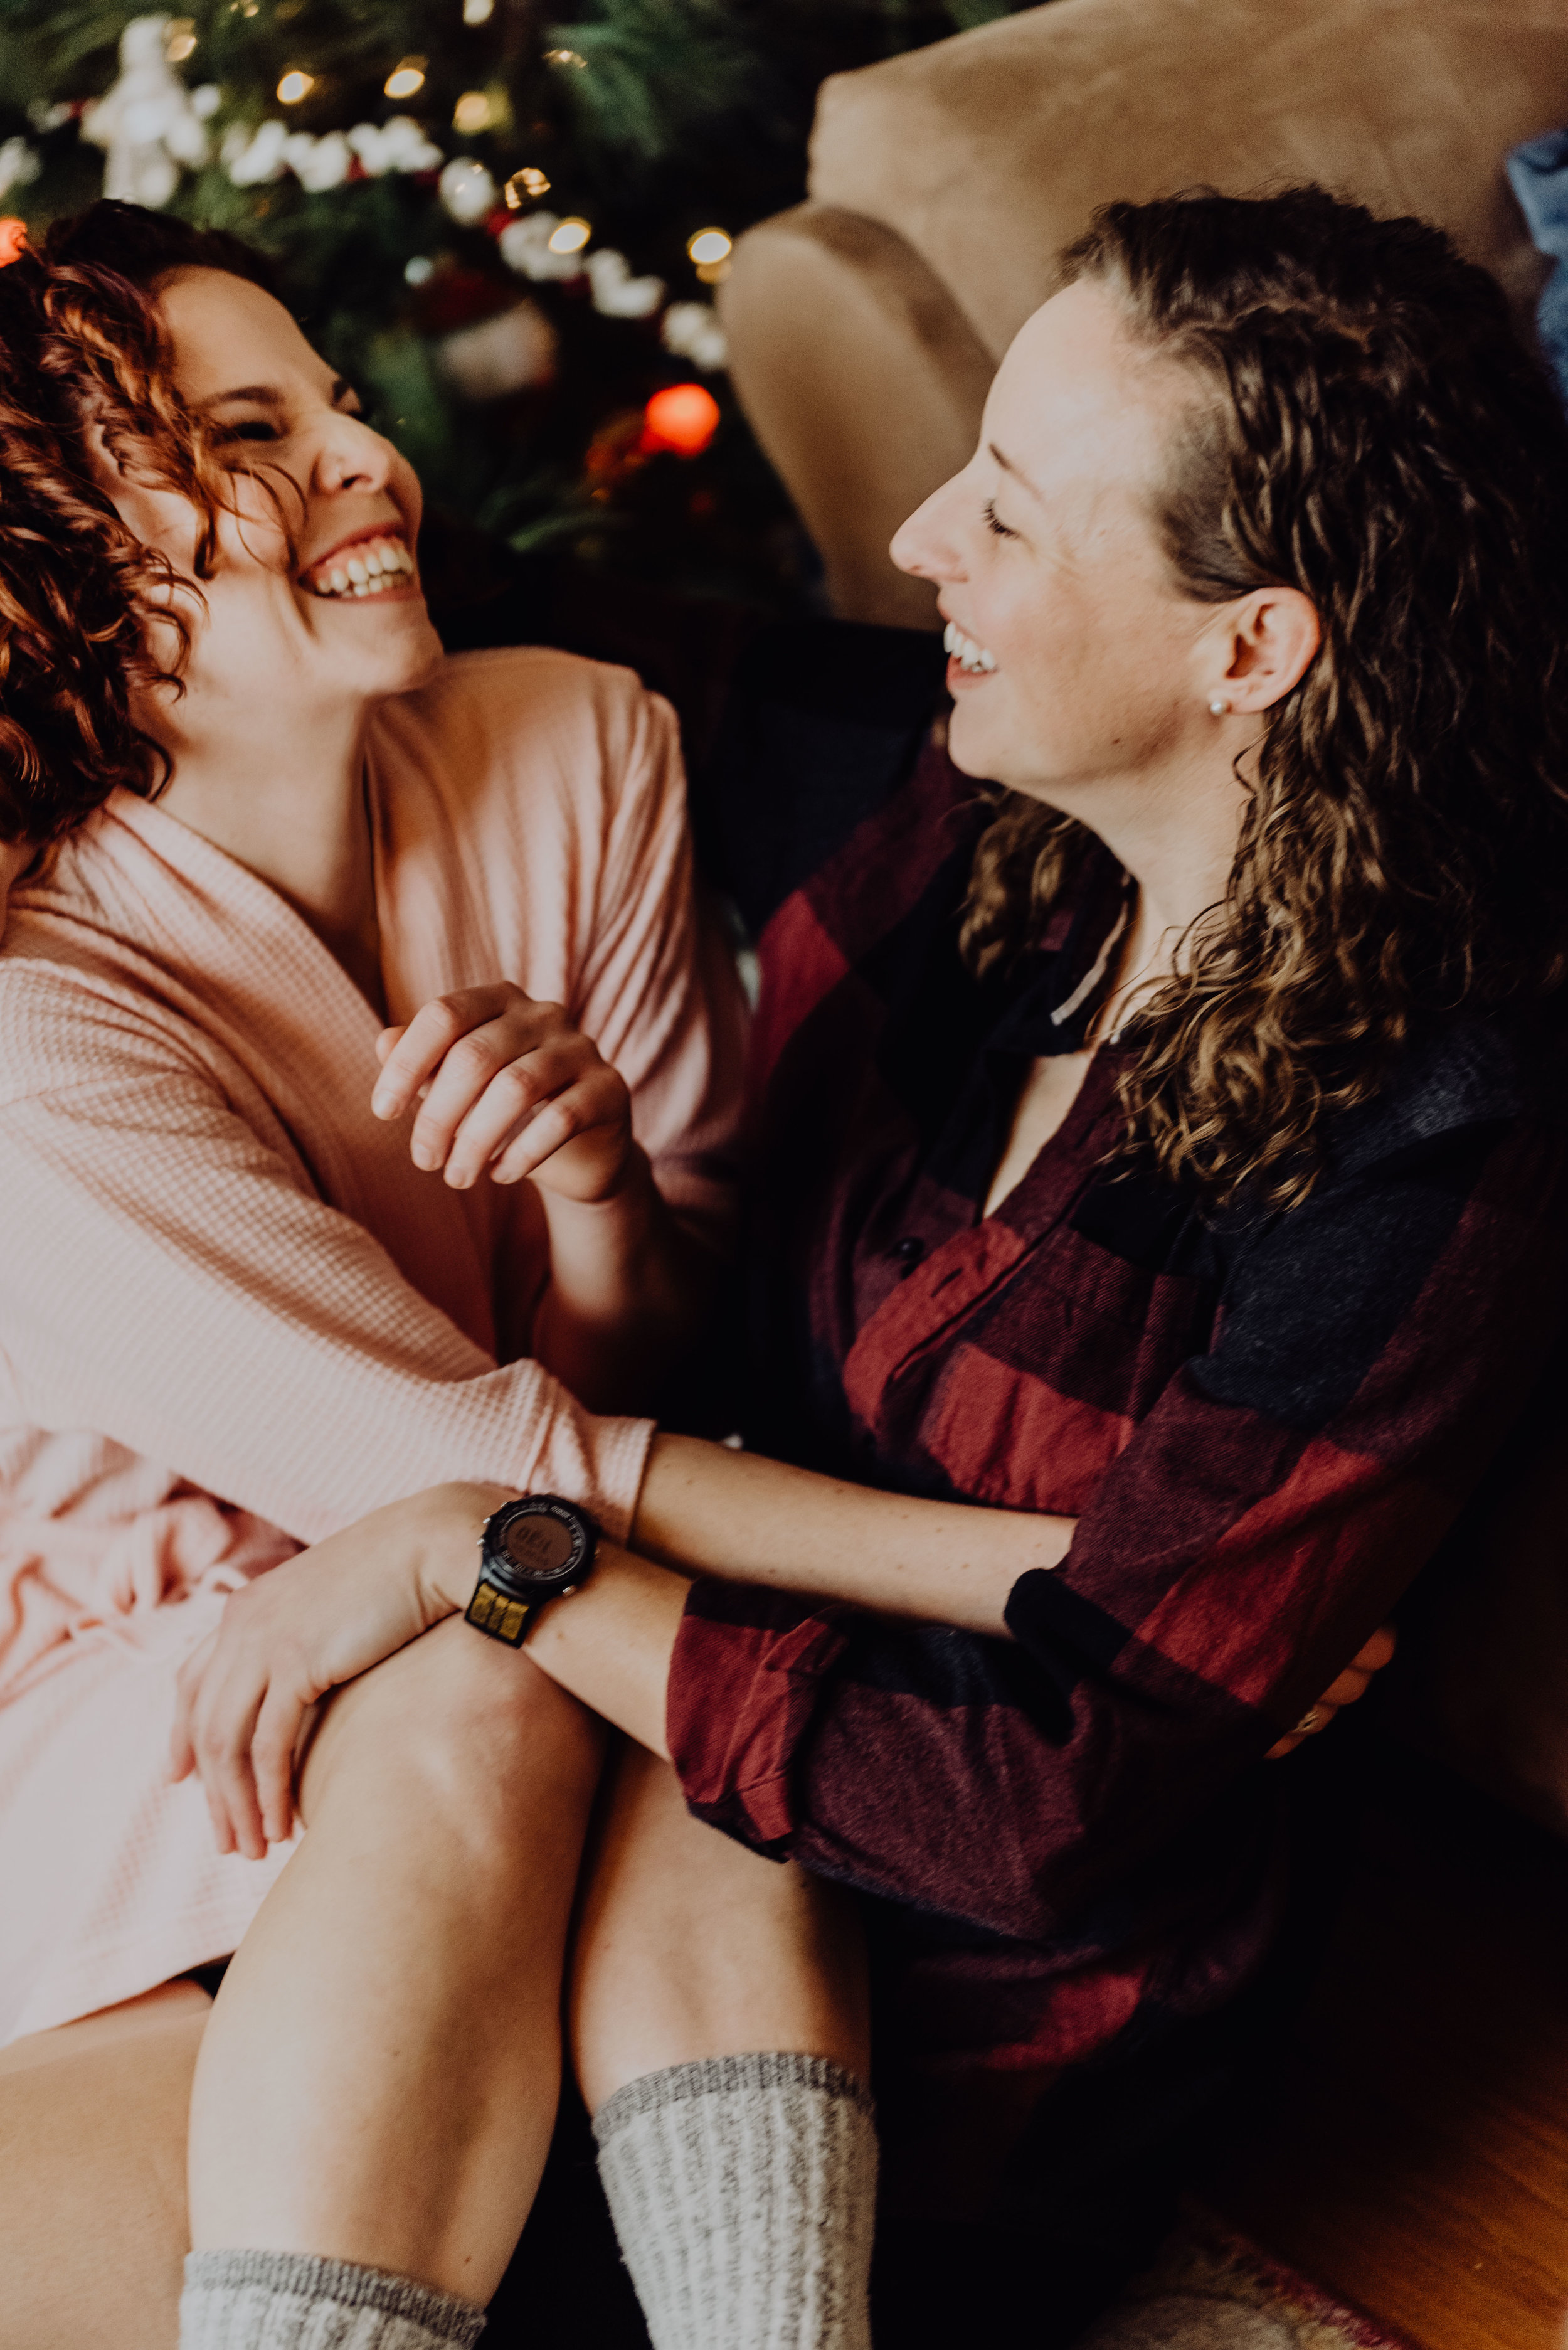 veronica chelsea couples session wilde company-6873-Edit-Edit.jpg